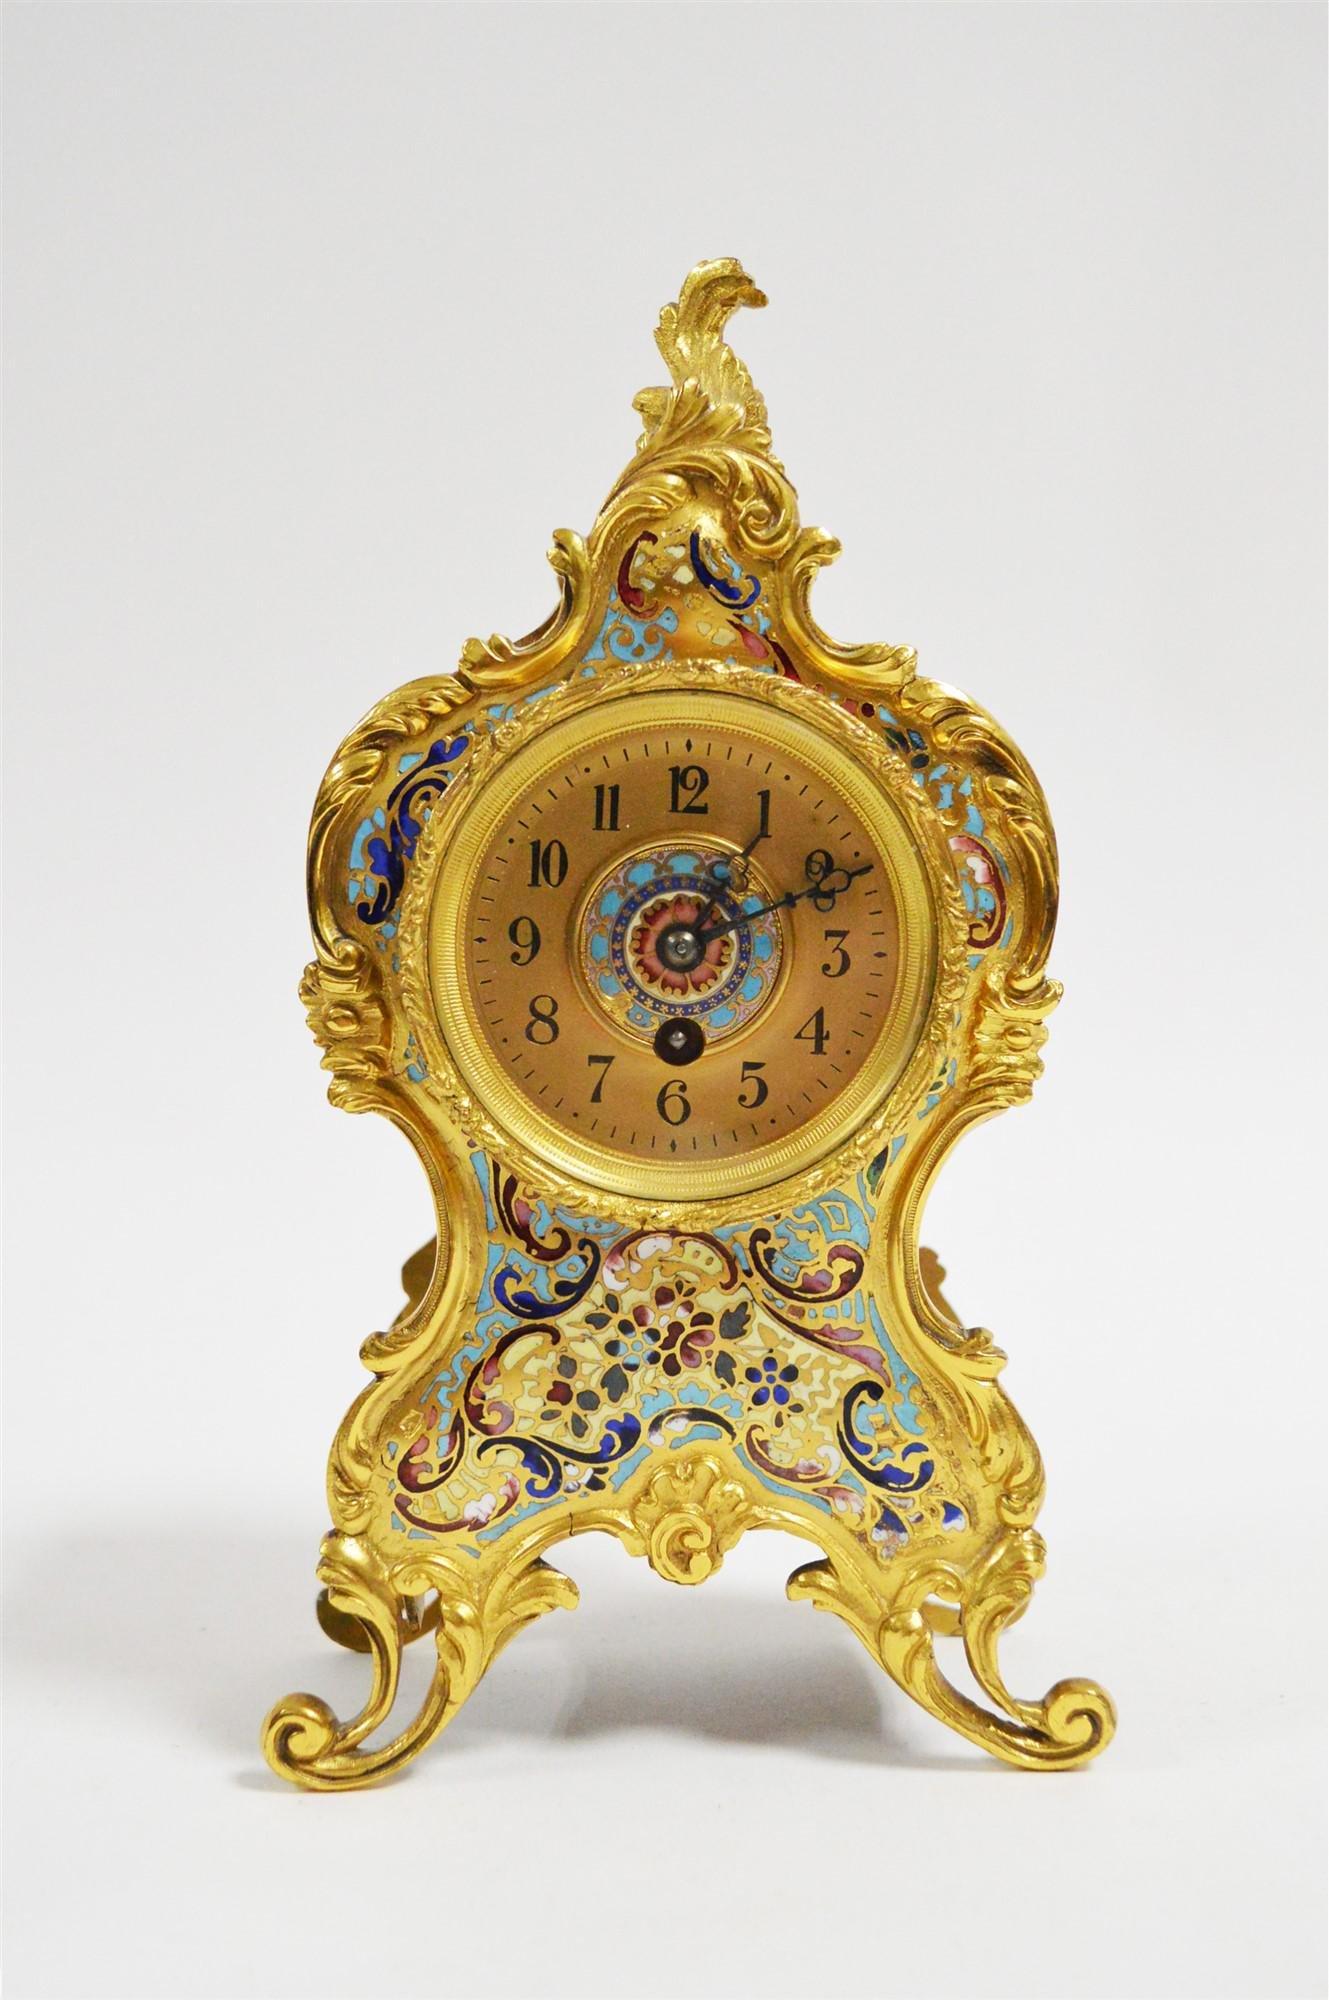 Champleve enamel mantel clock